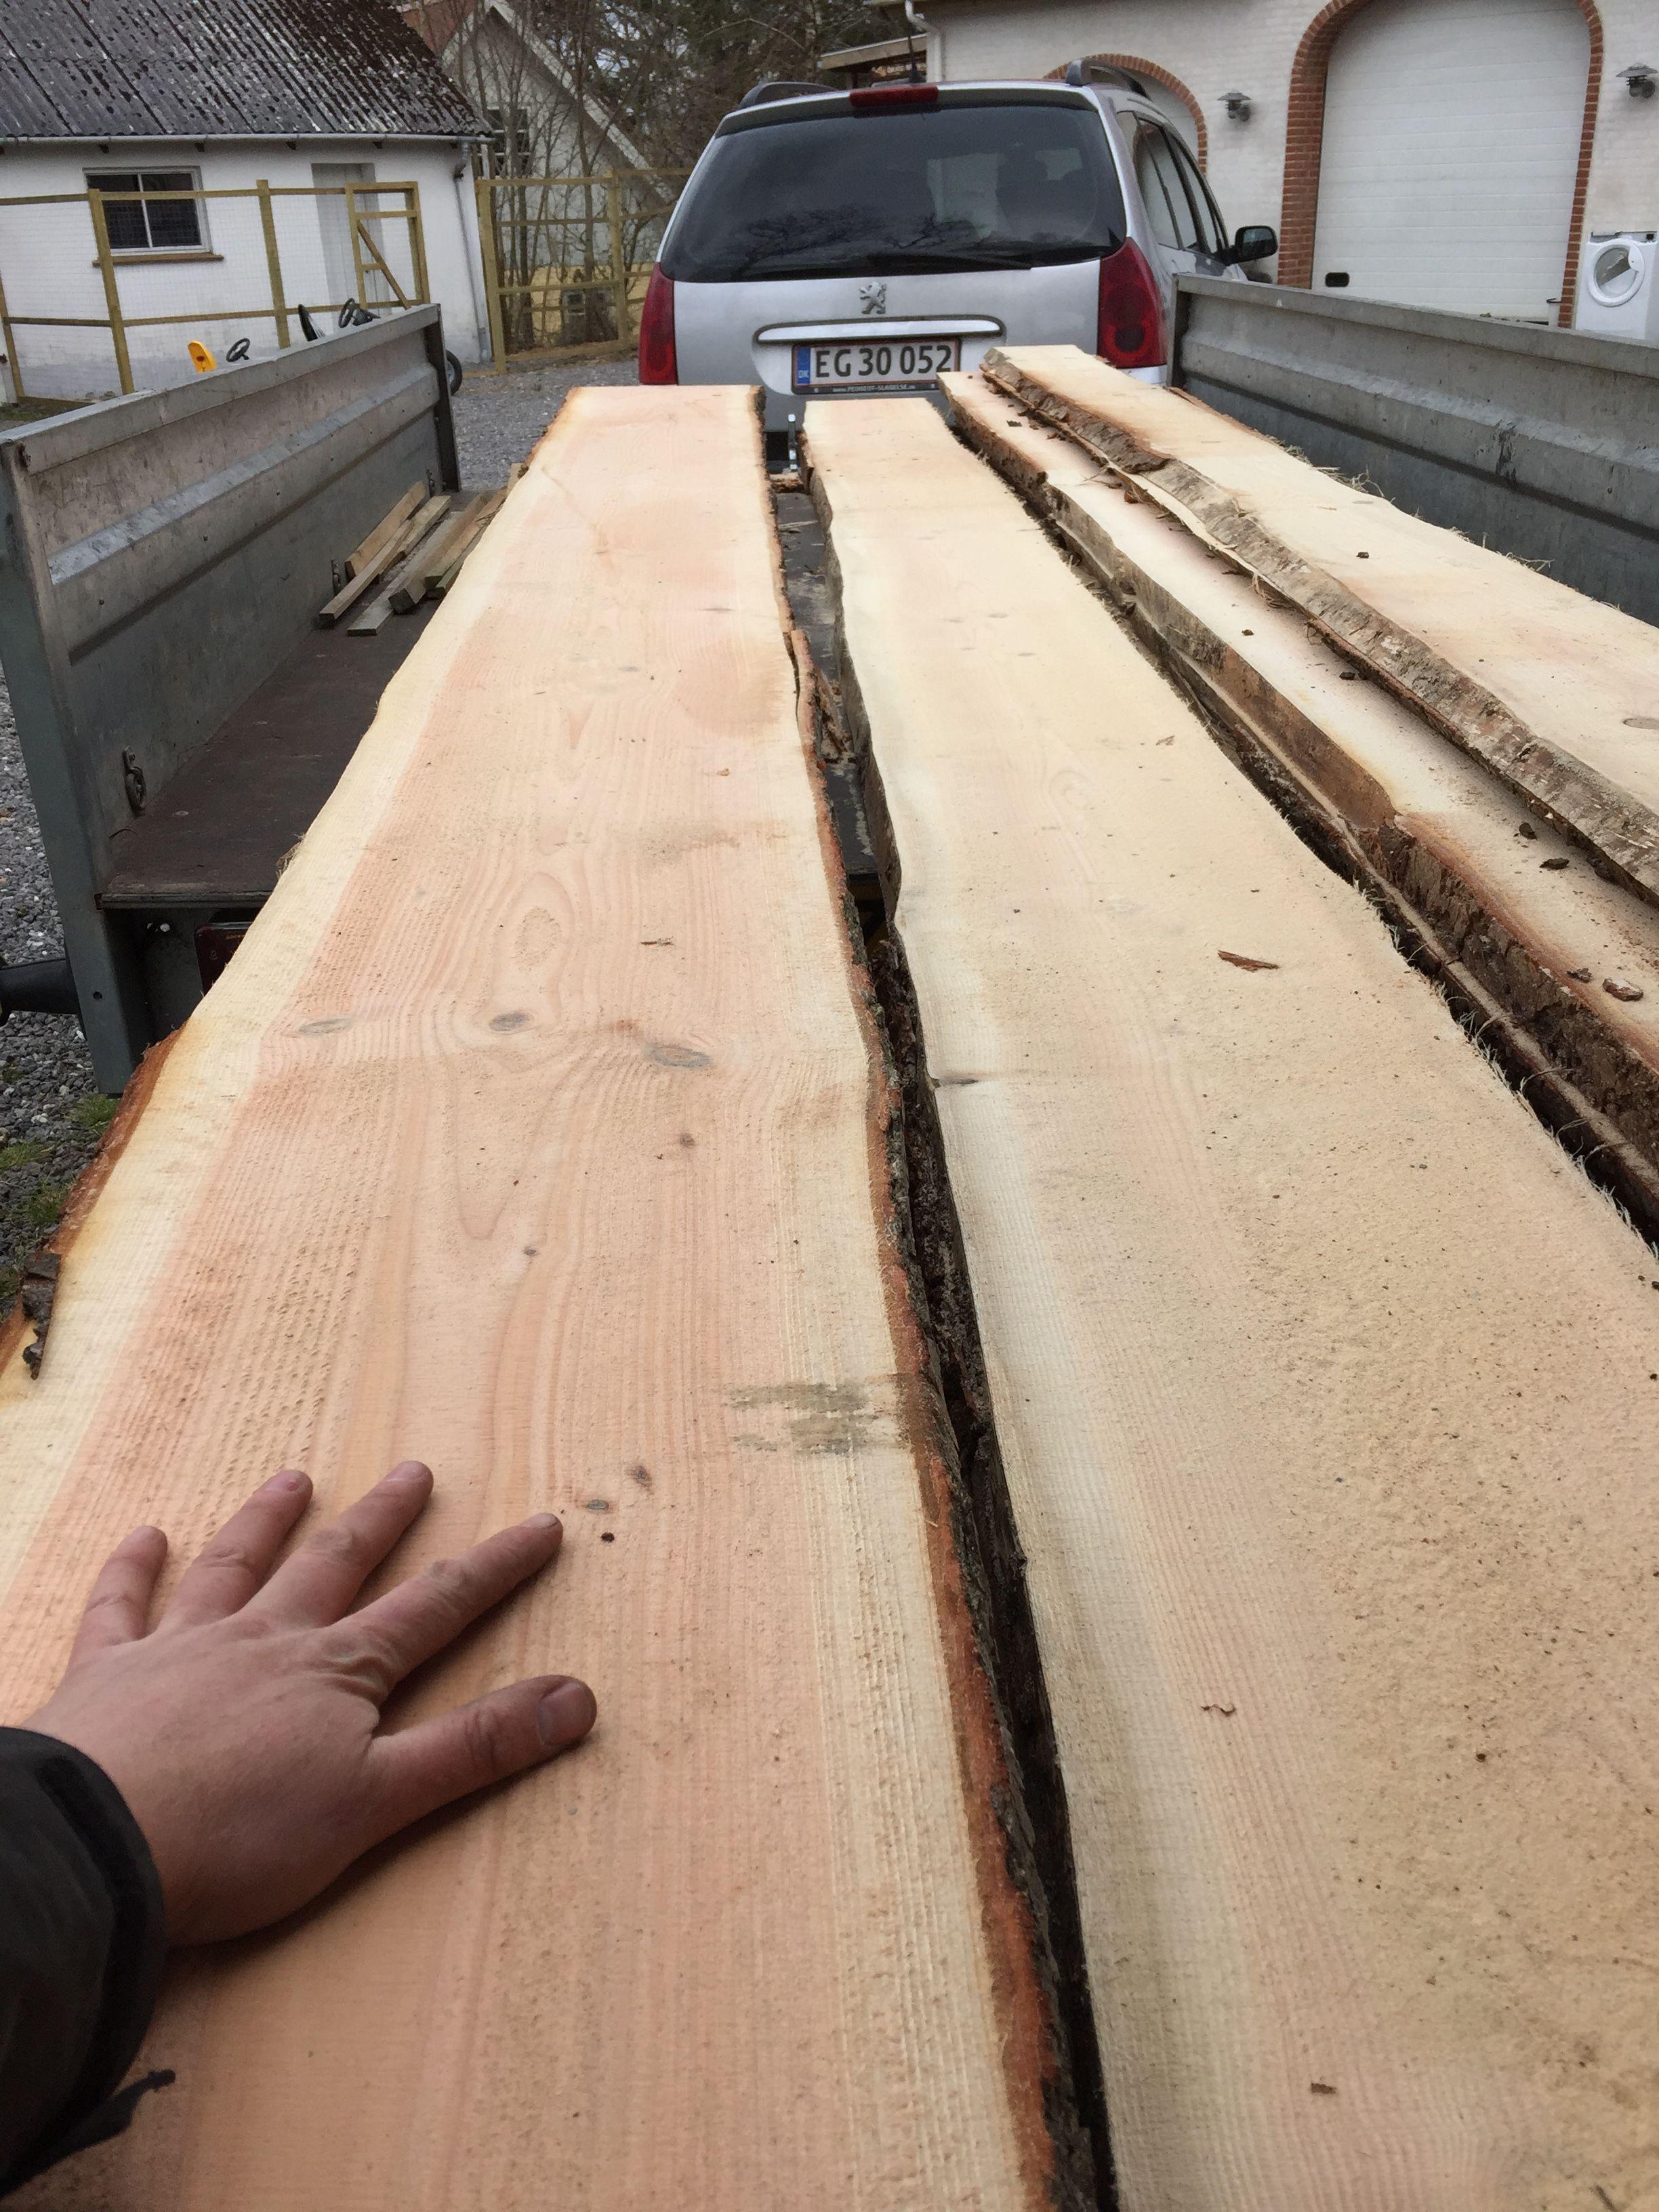 Wandplank 1 Meter.Materialer Til Et Hojbed Pa 3 8 X 1 2 Meter Douglas Plank 5 1 Meter